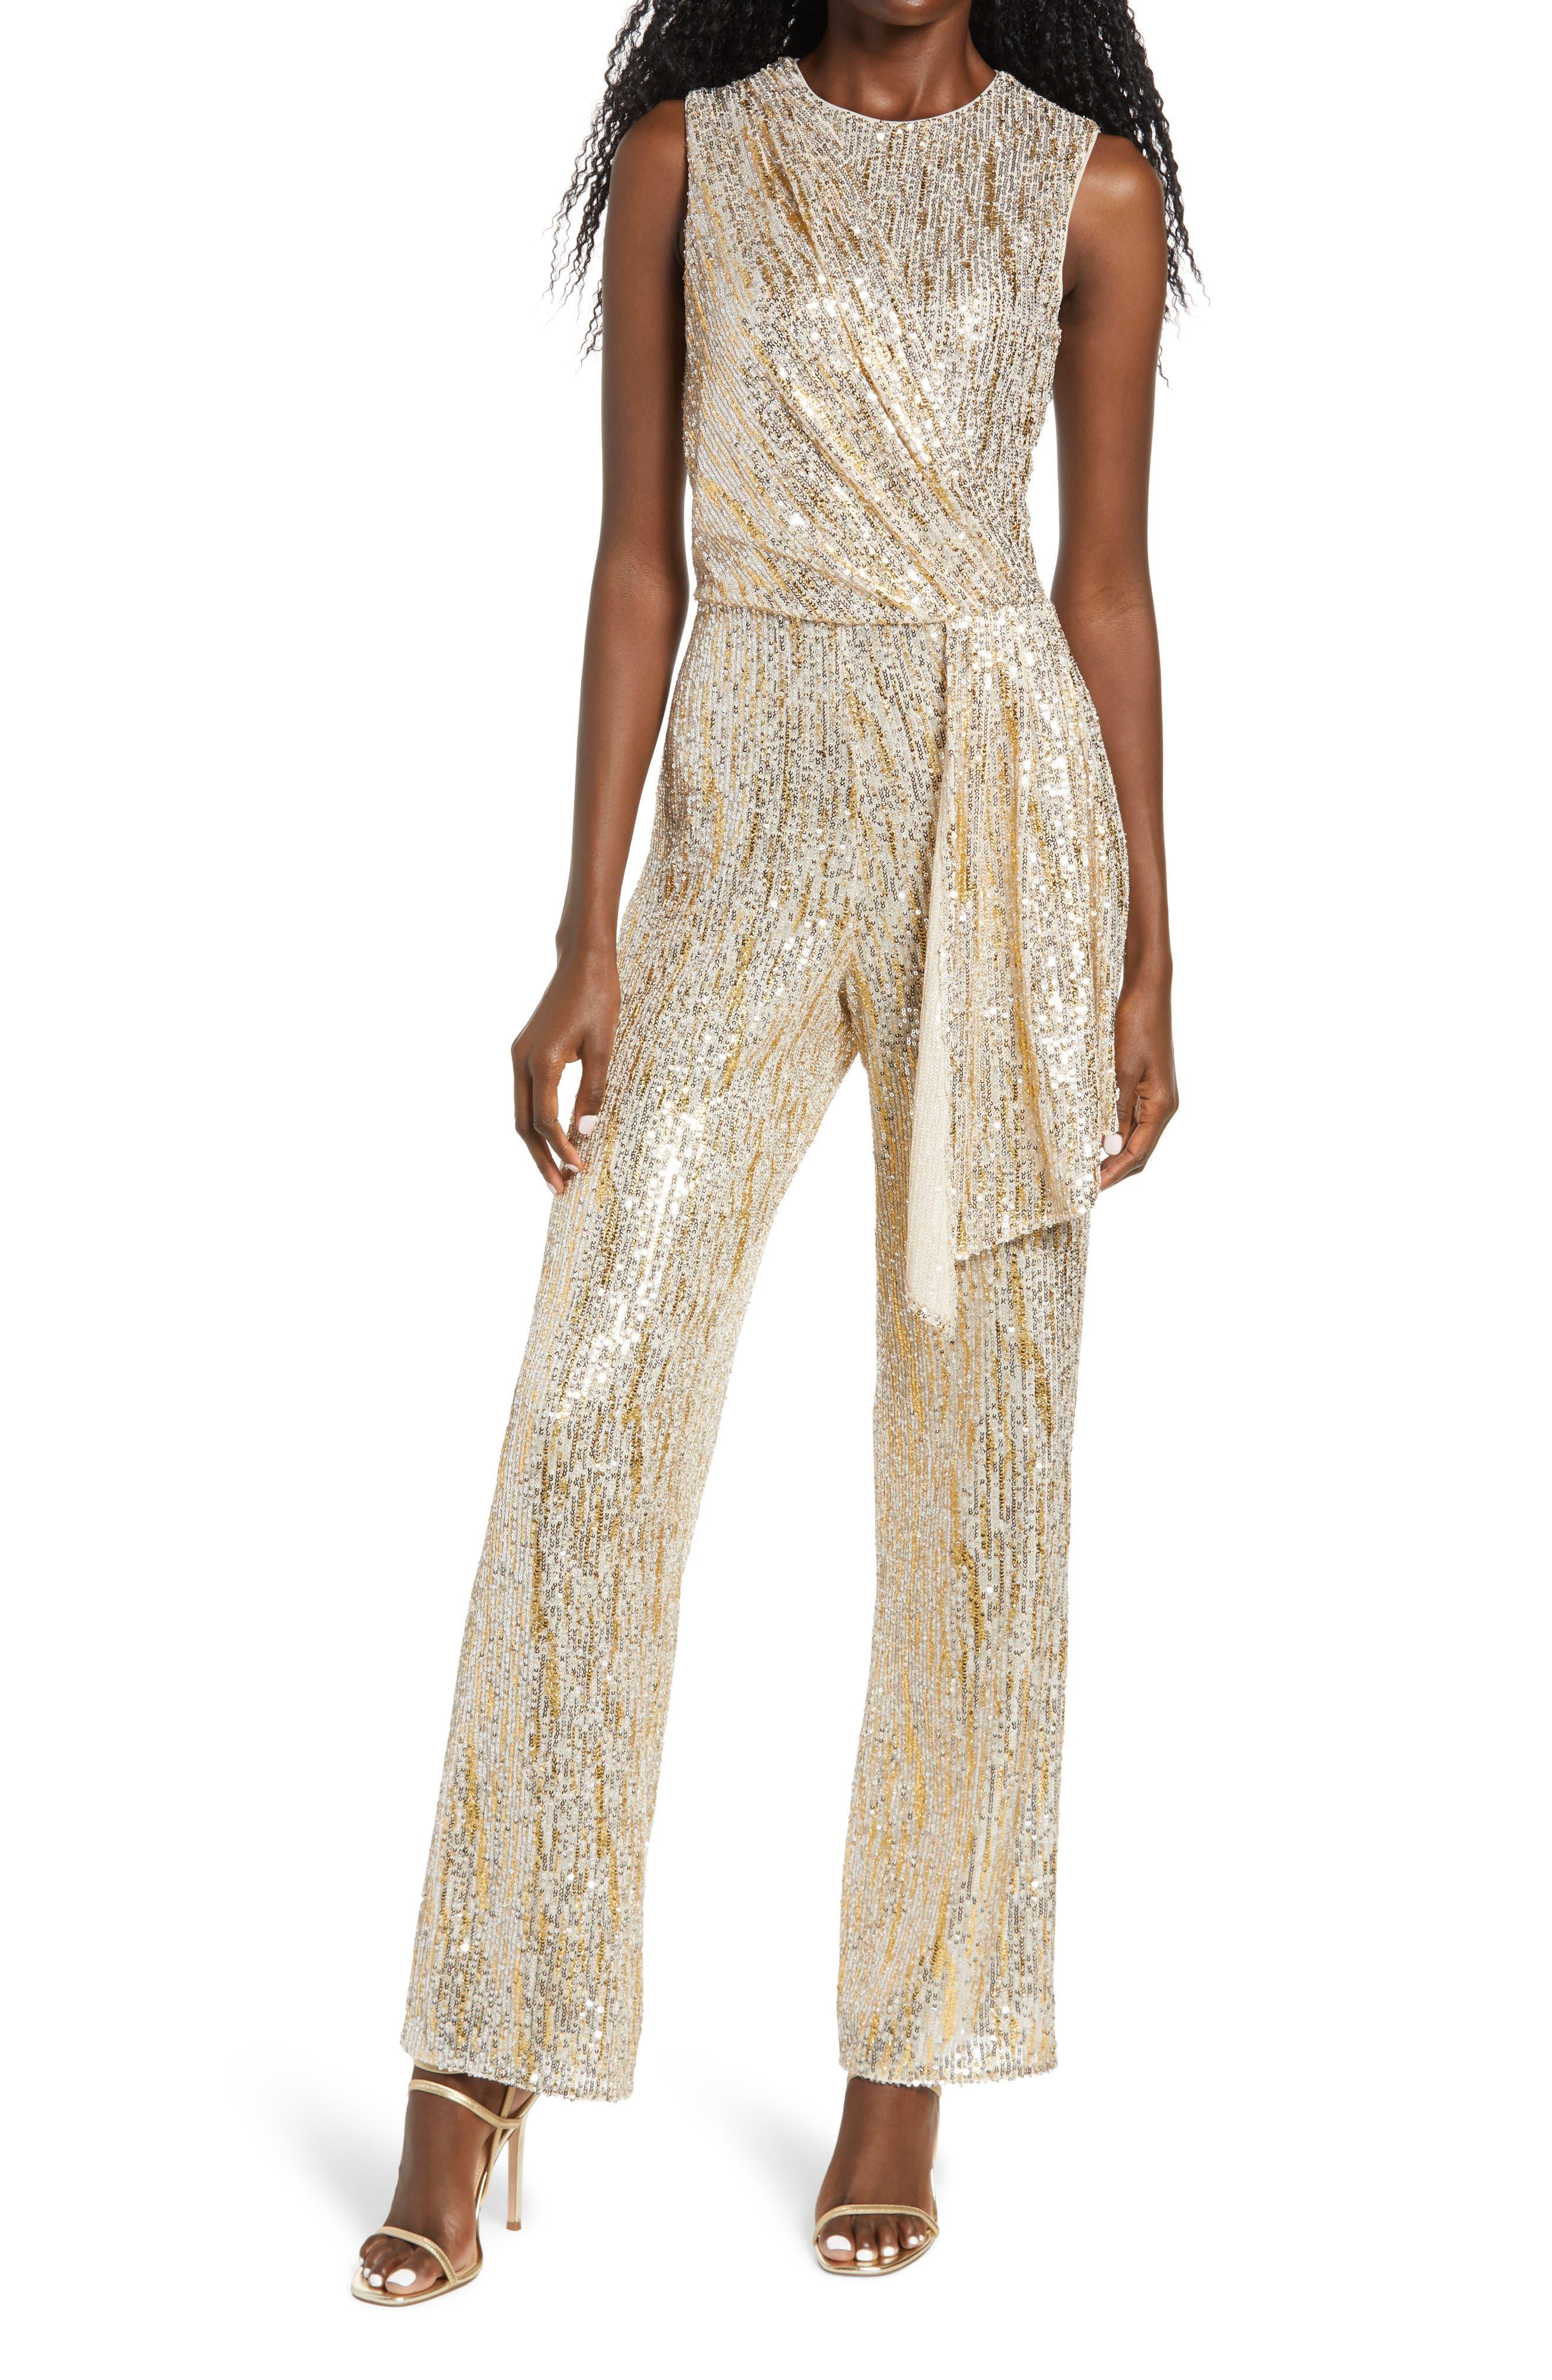 Saylor Briar Gold Foiled Sequin Sleeveless Jumpsuit   Nordstrom